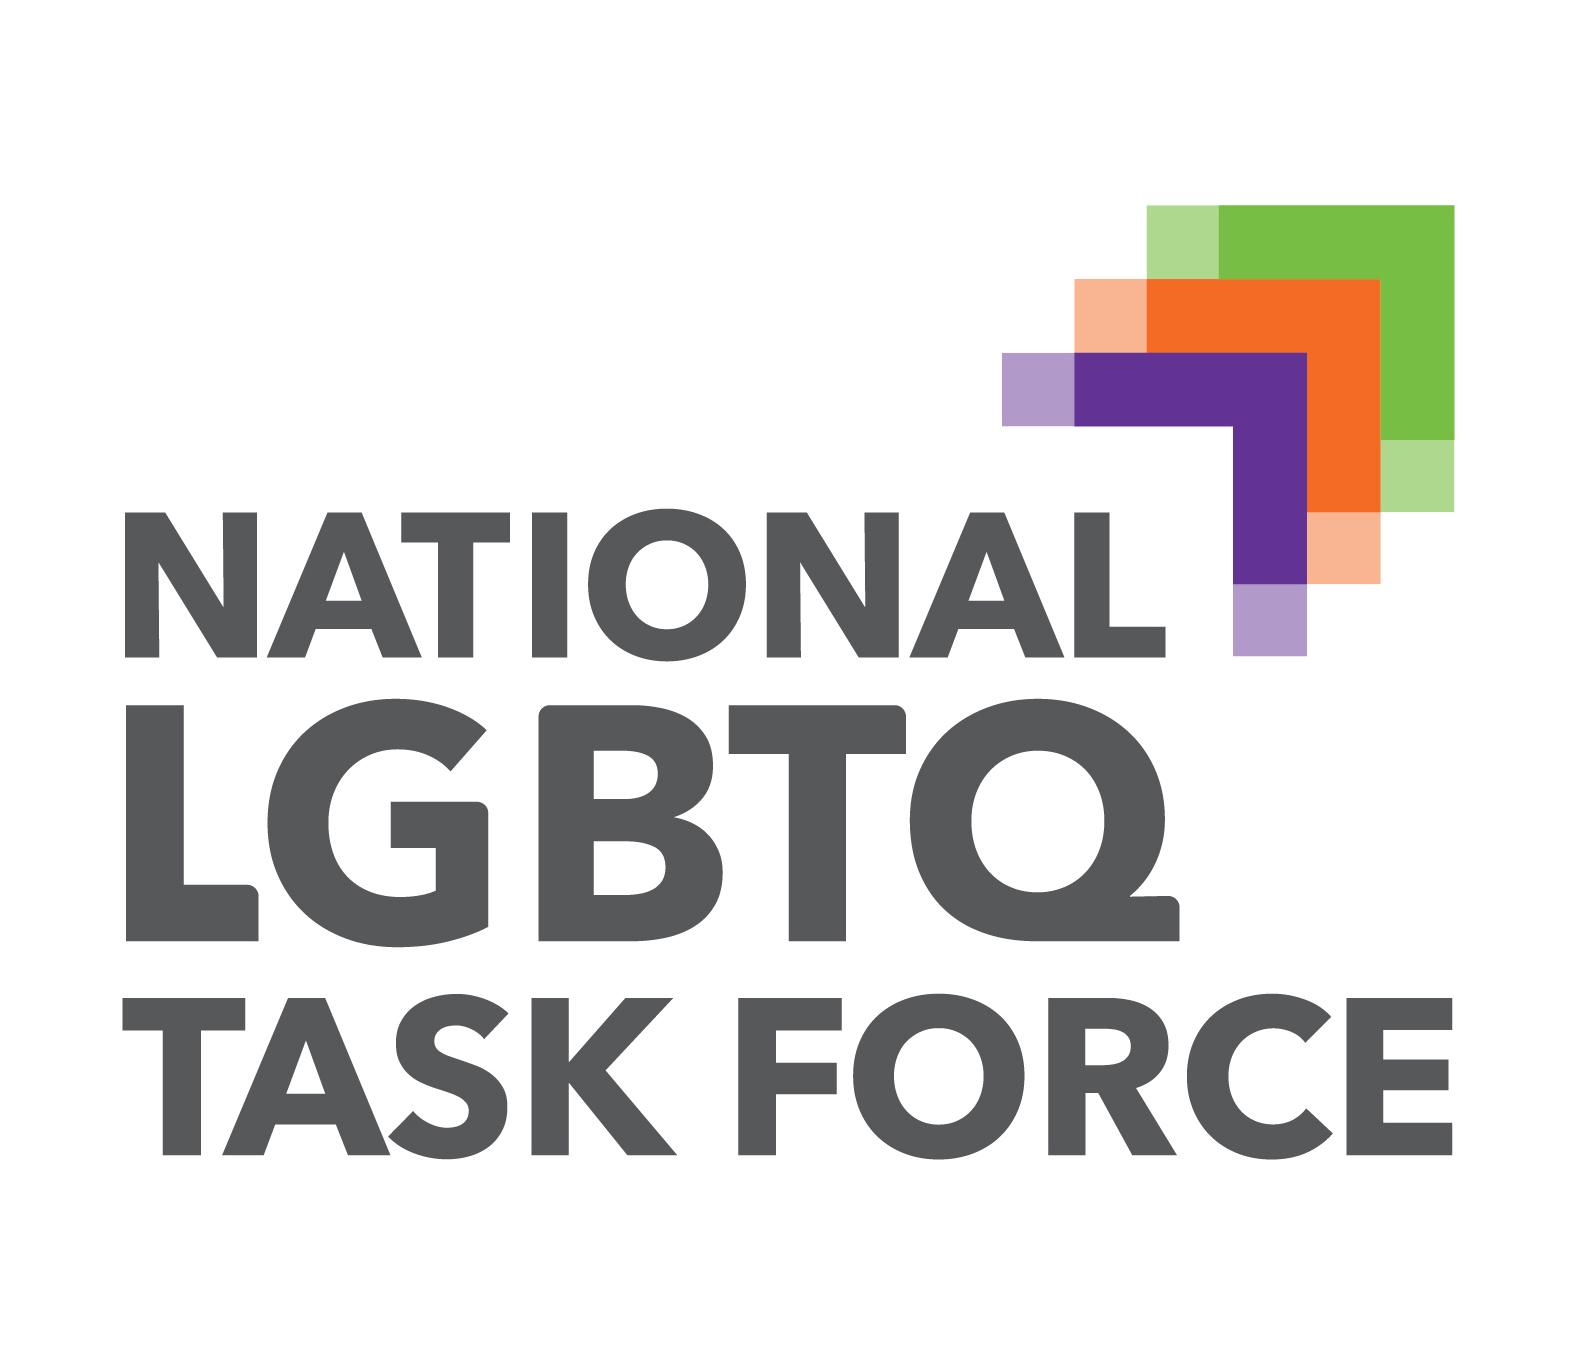 National-LGBTQ-Task-Force.jpg